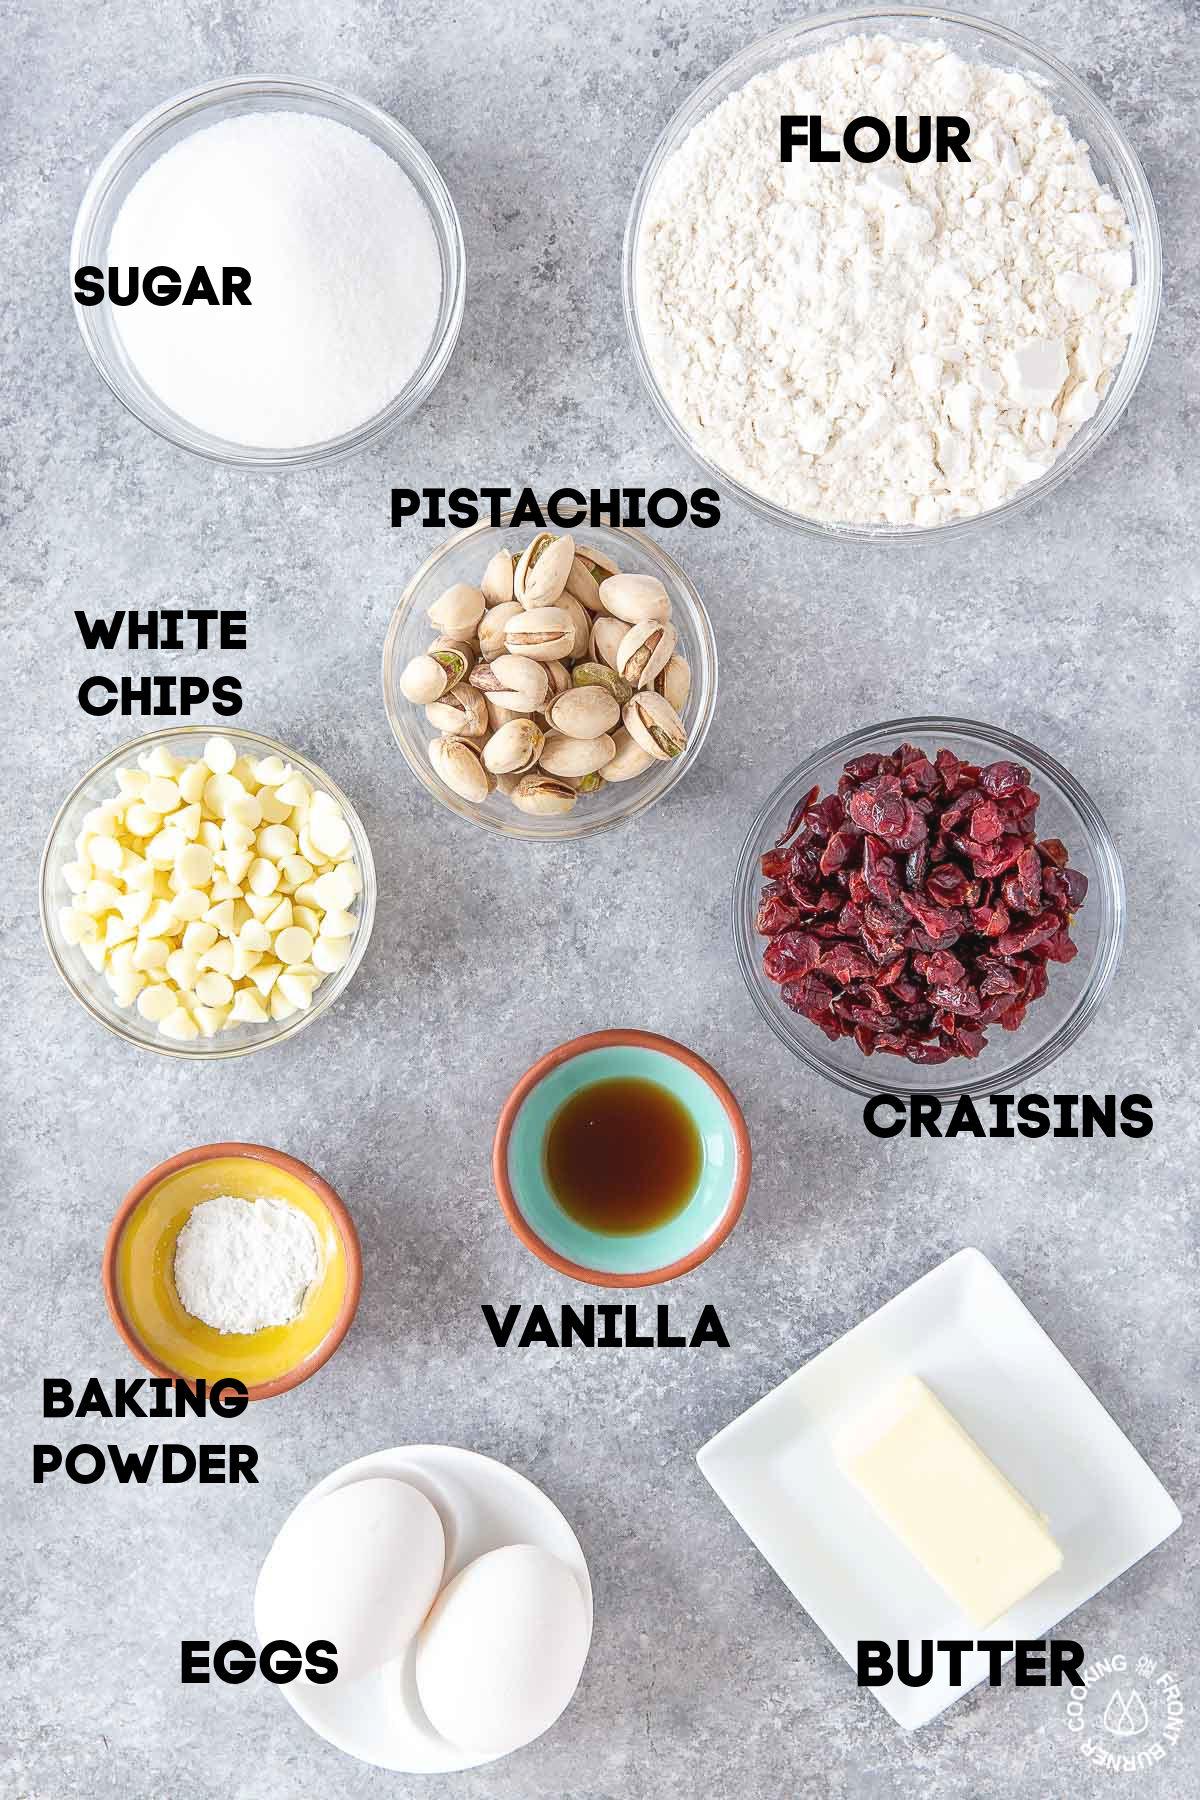 bowls of sugar, flour, pistachios, white chocolate chips, craisins, vanilla, baking powder, butter